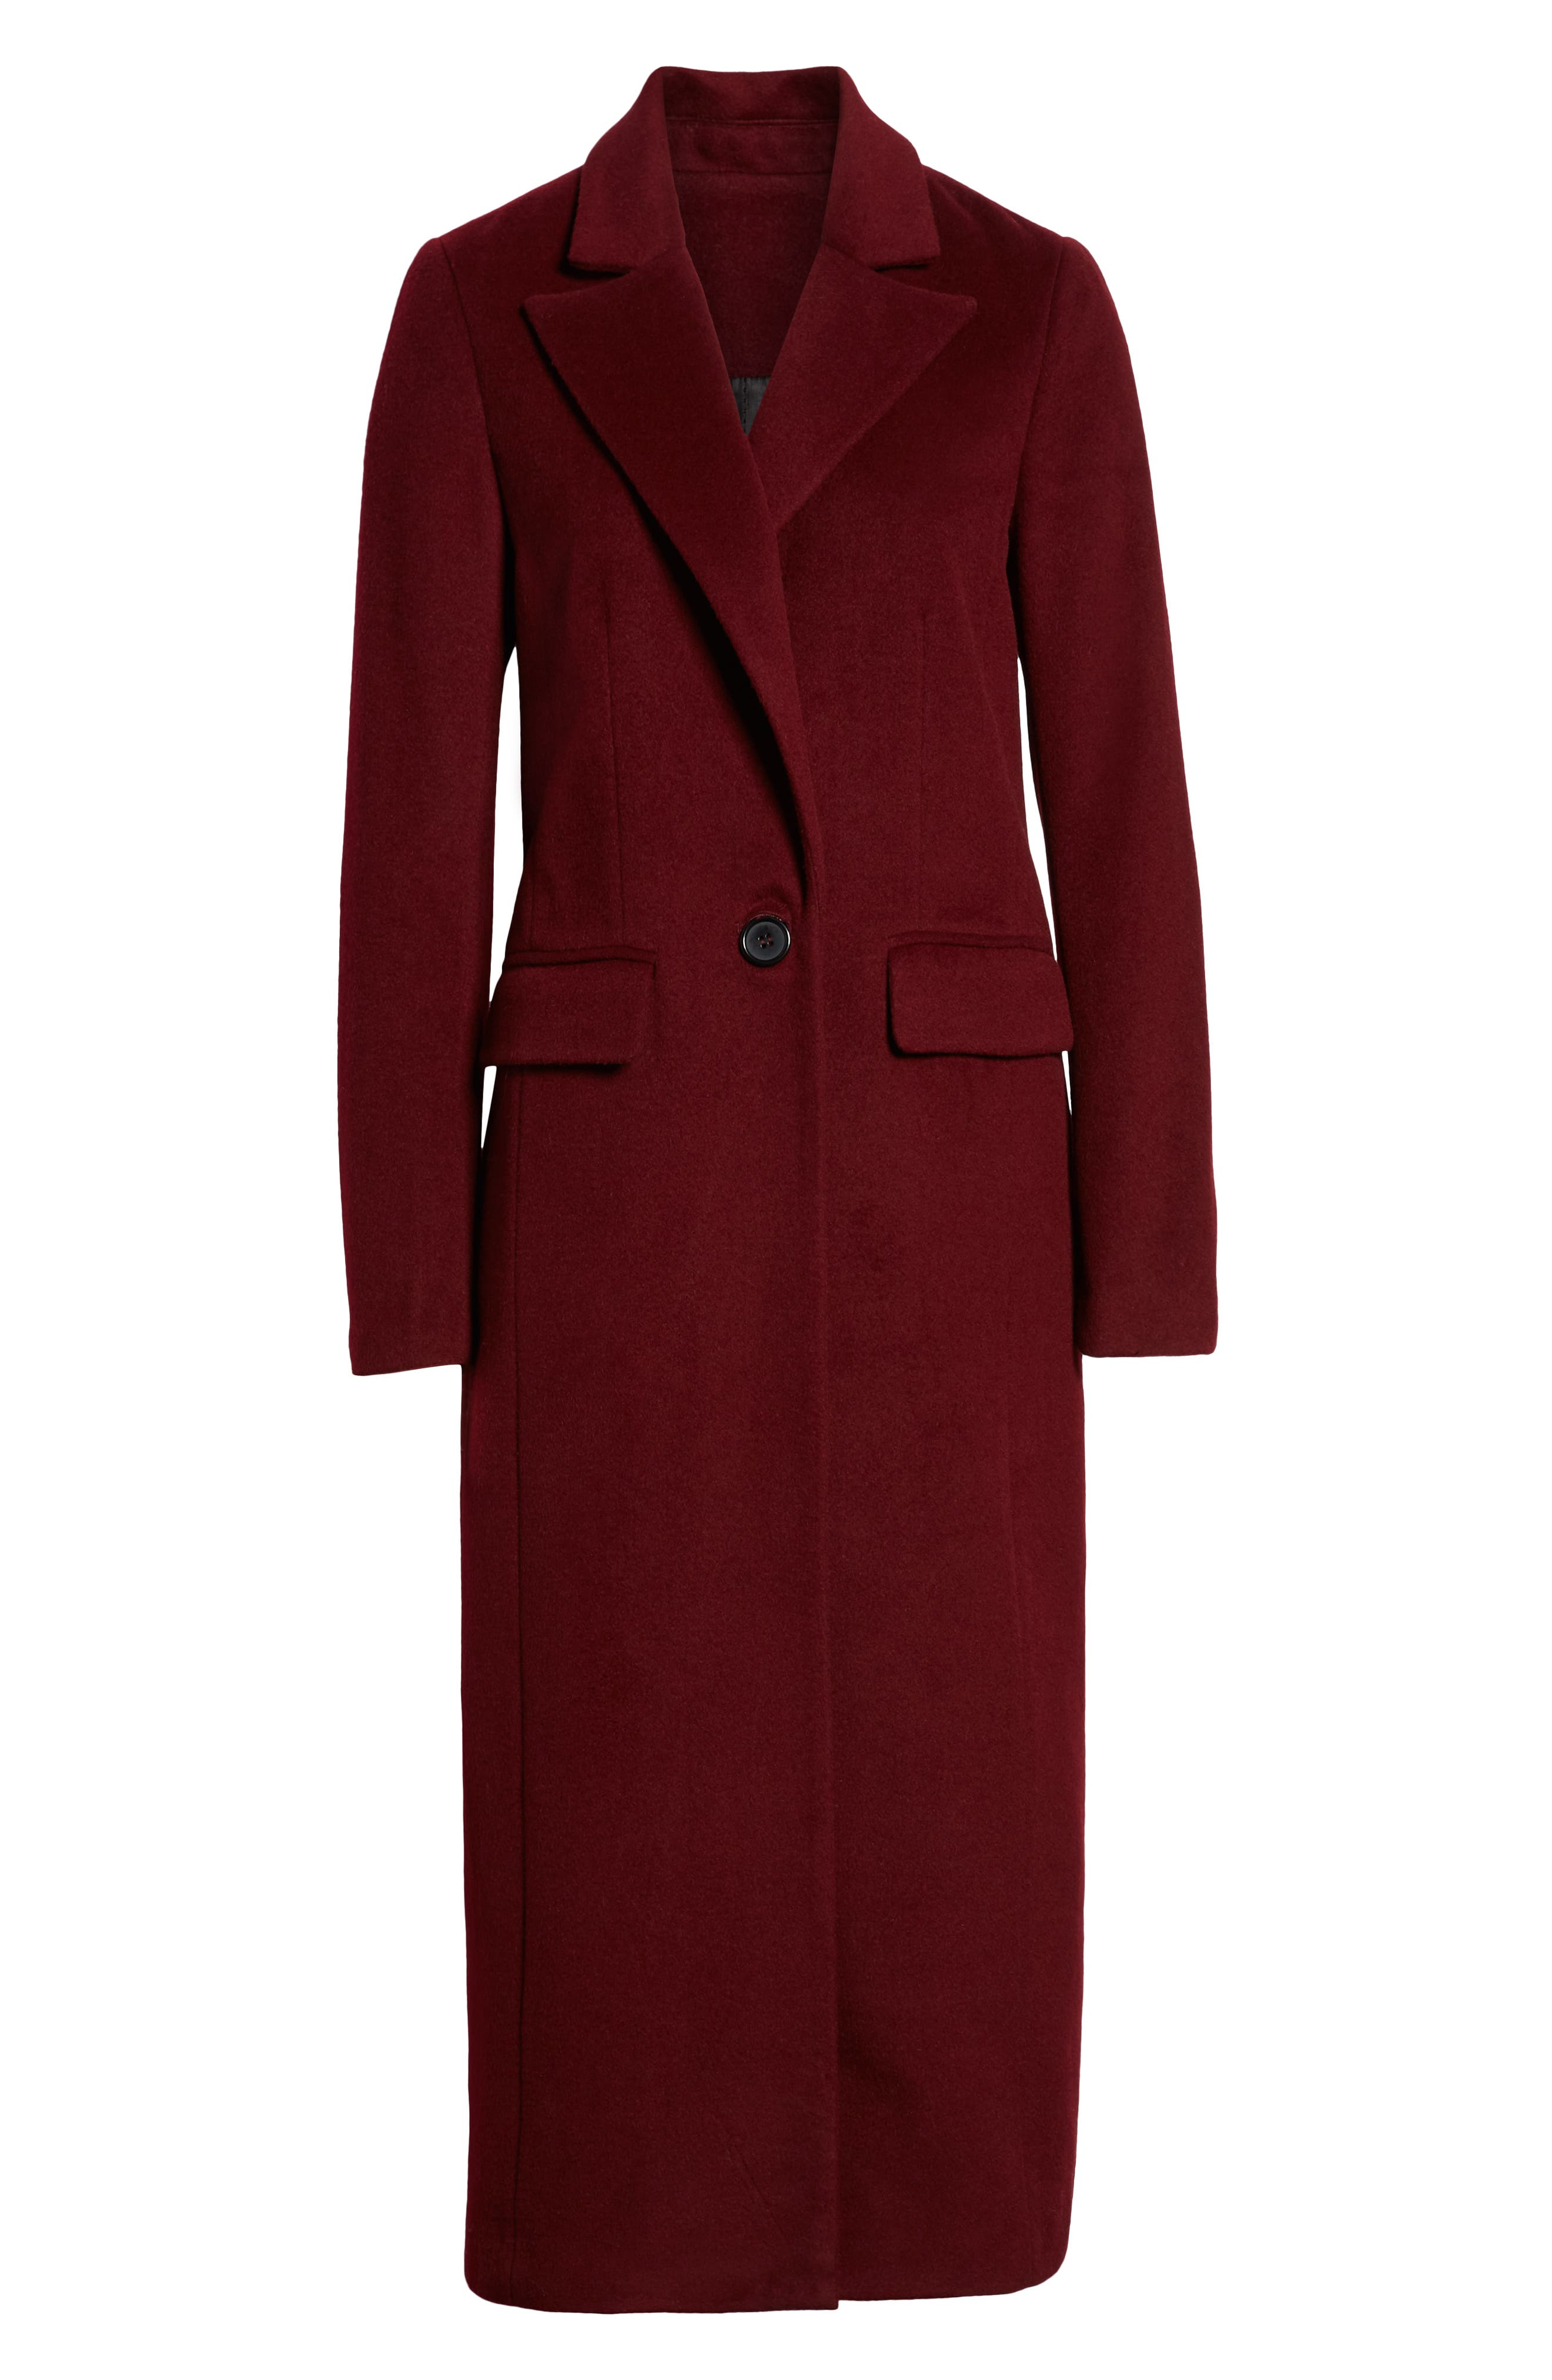 Wool Blend Menswear Coat,                             Alternate thumbnail 6, color,                             BURGUNDY